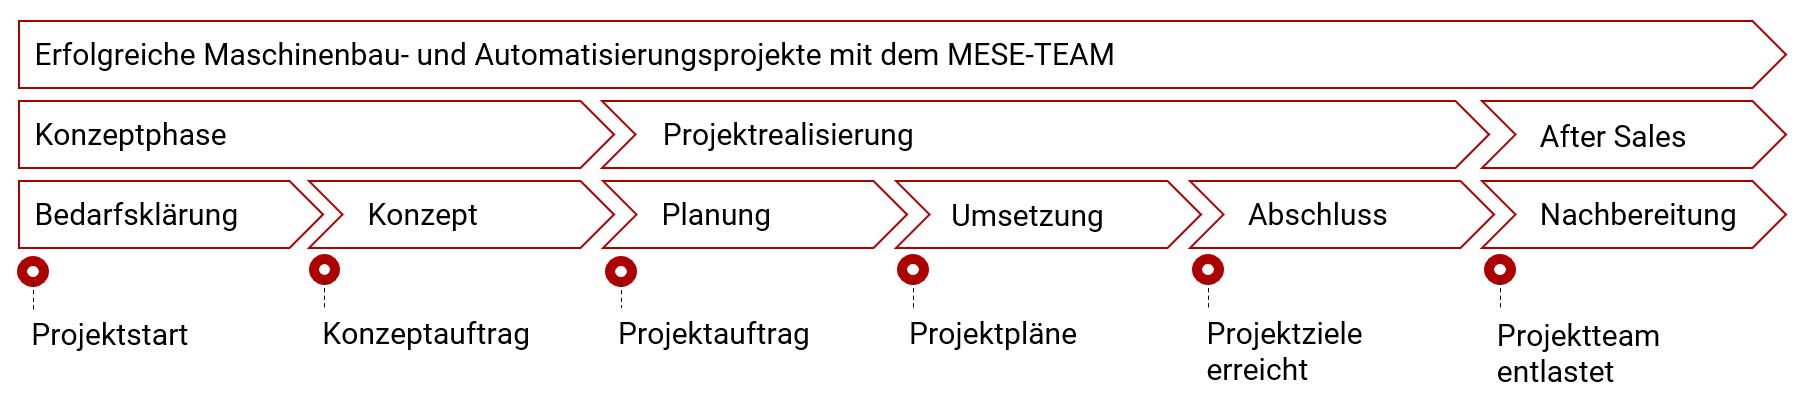 Projektstruktur Maschinenbau Automatisierung - MESE